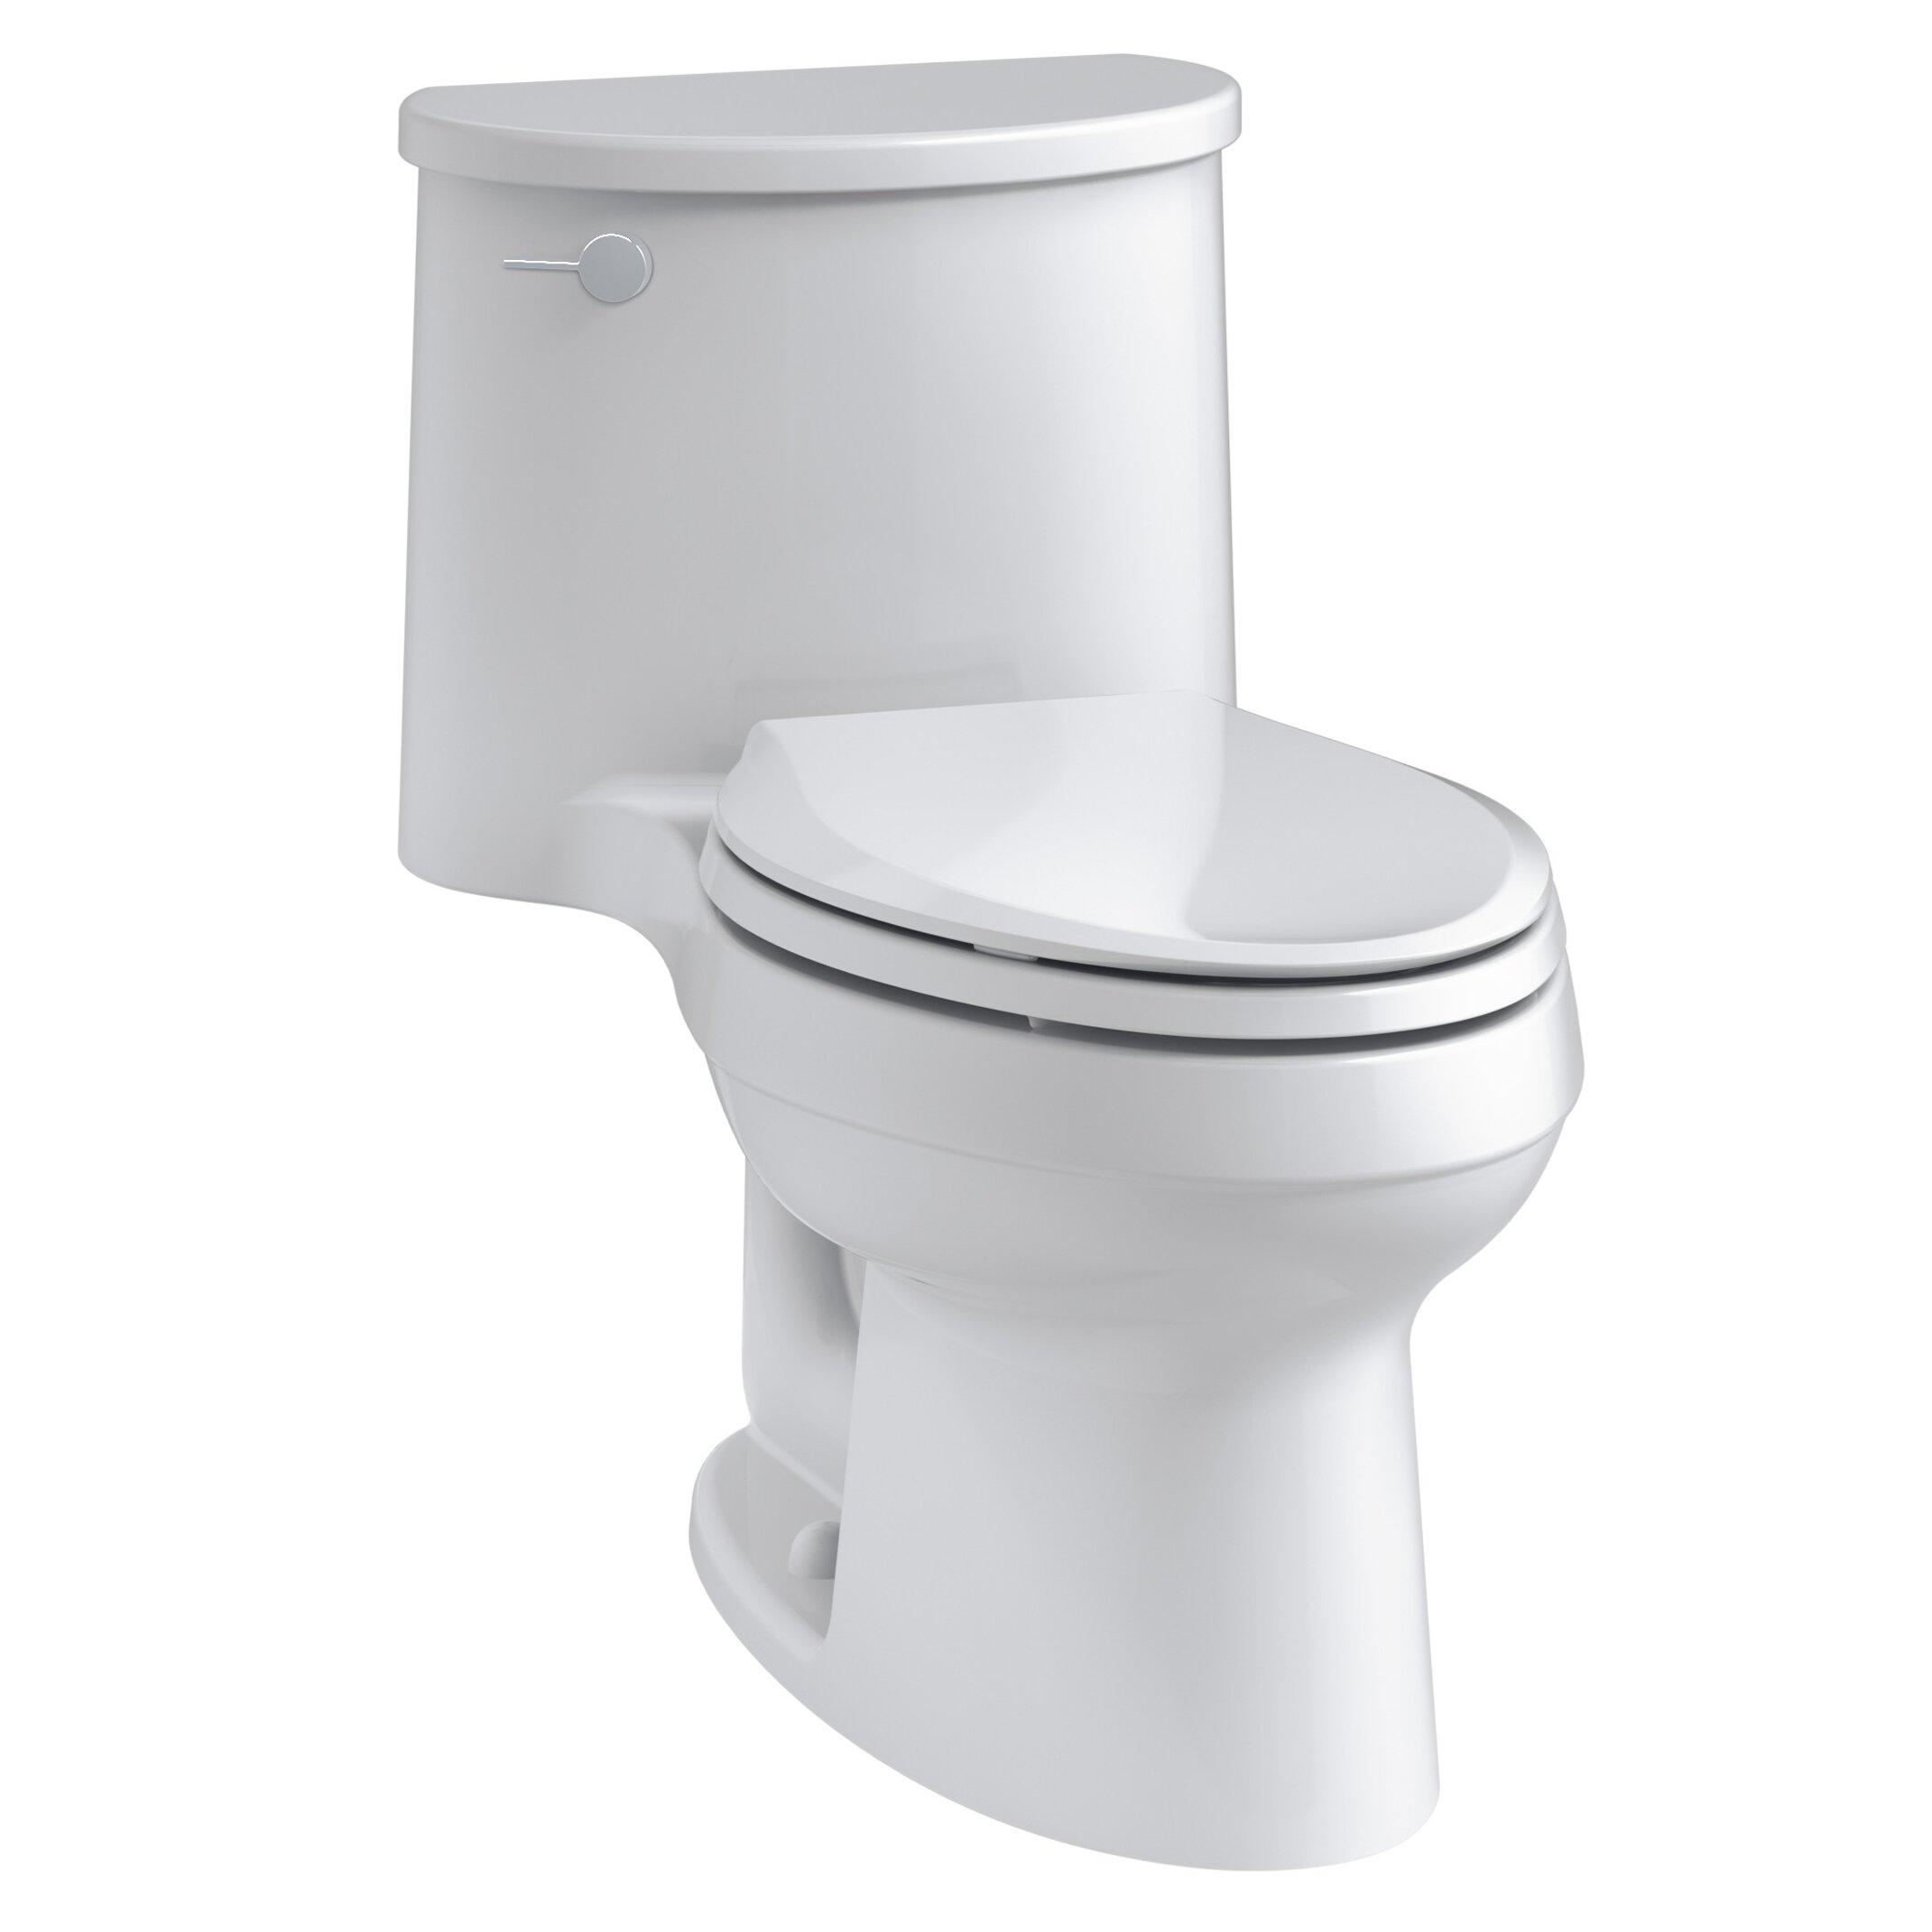 Adair One Piece Elongated 1 28 Gpf Toilet With Aquapiston